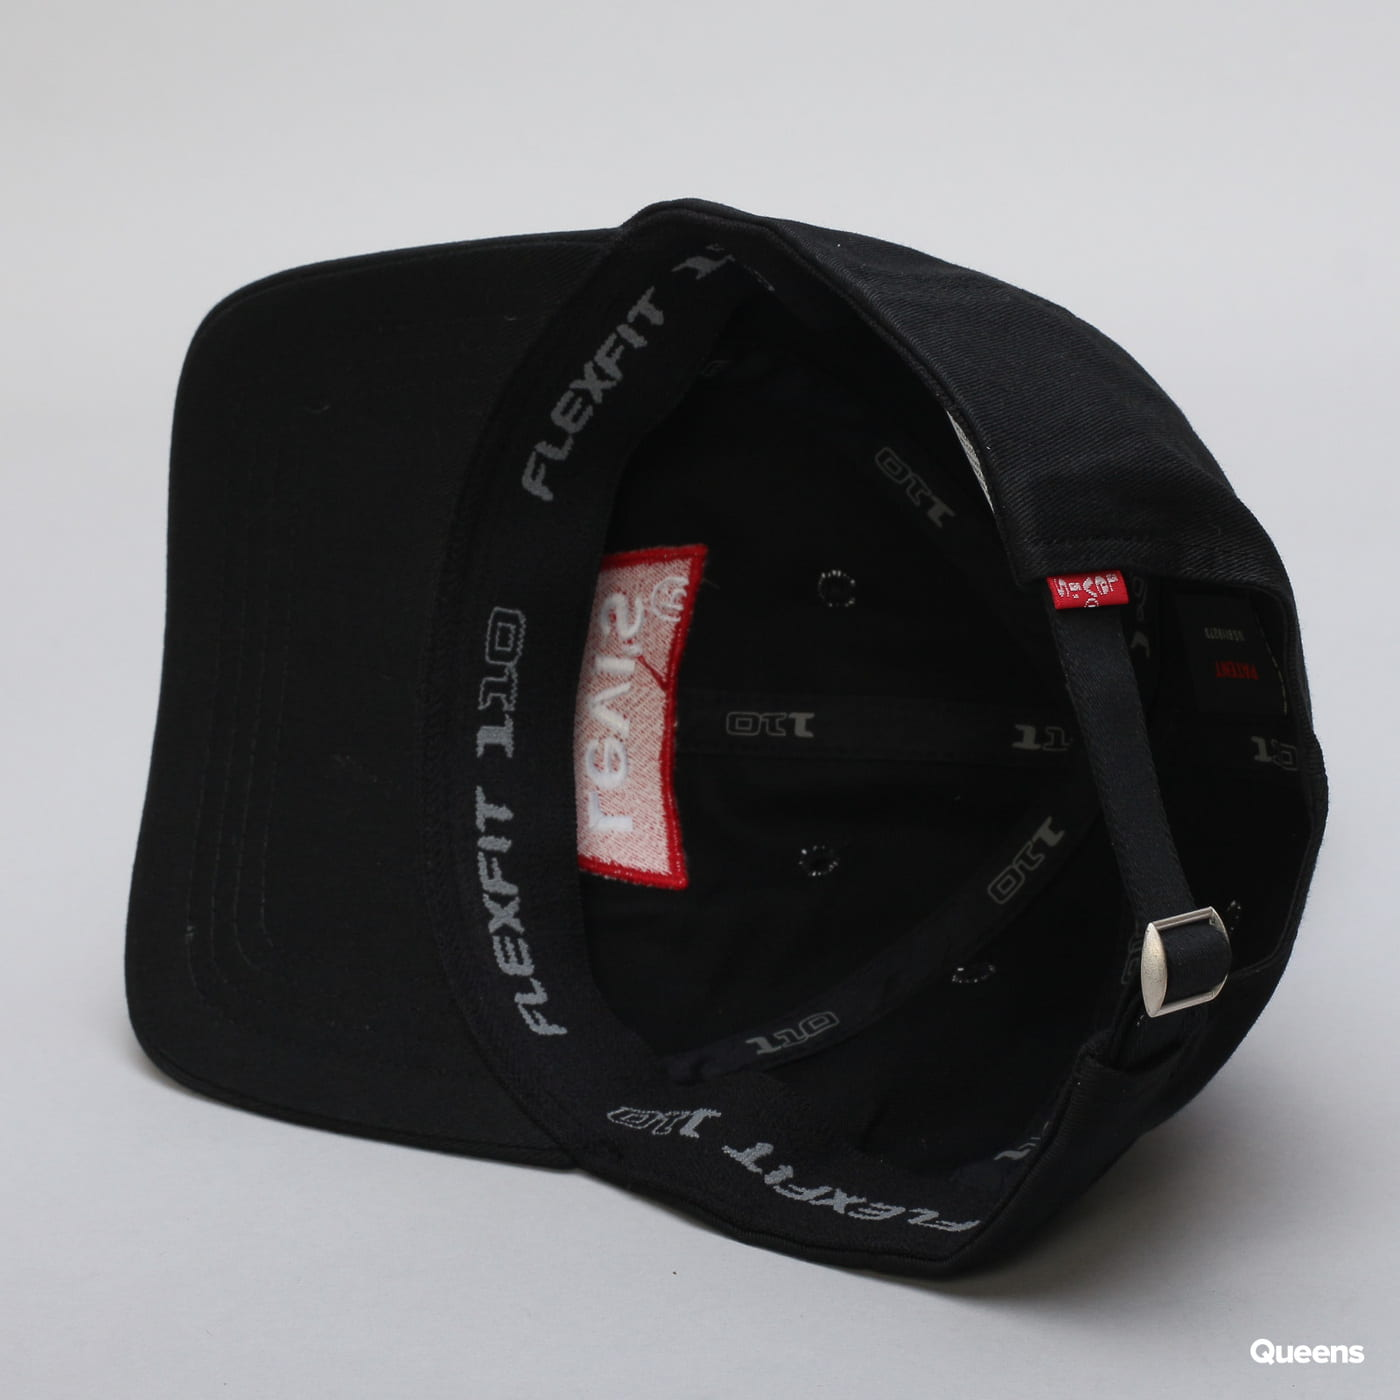 Levi's ® Big Batwing Flex Fit black